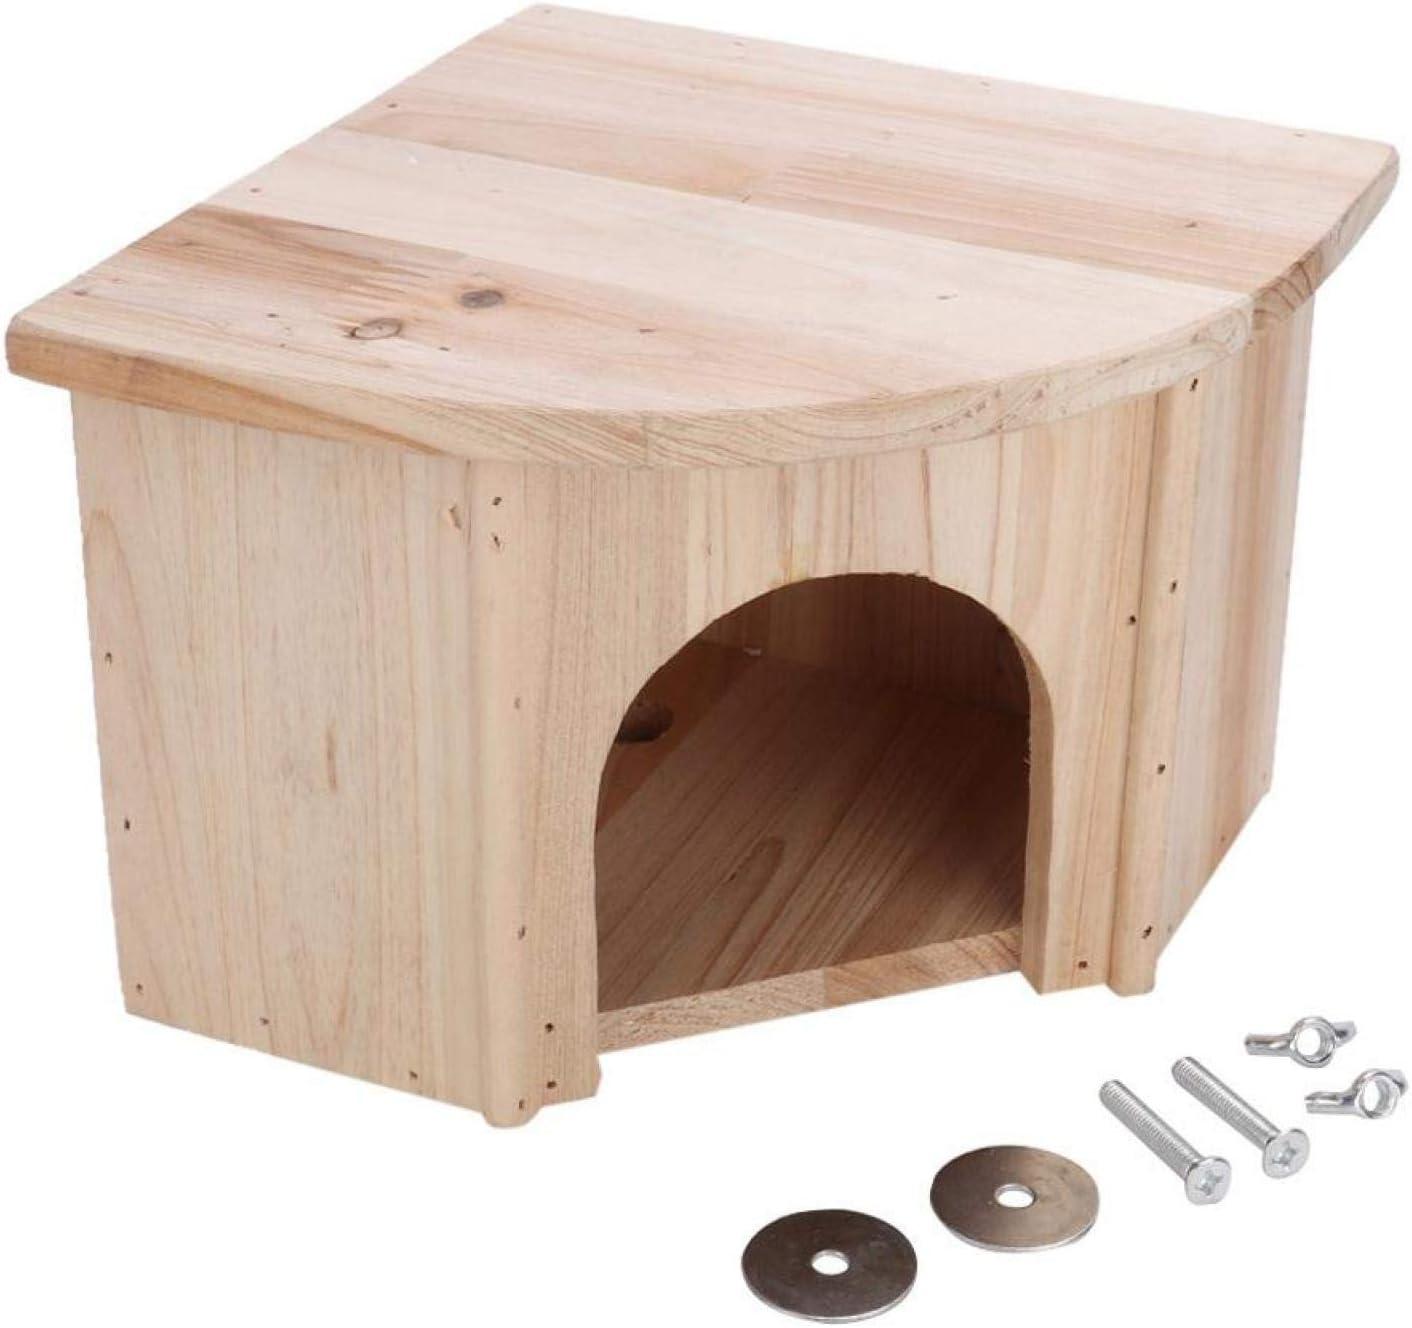 Yunduo Max 68% OFF Wooden Pet House DIY Hamster Popularity Shel Chinchilla Small Animal